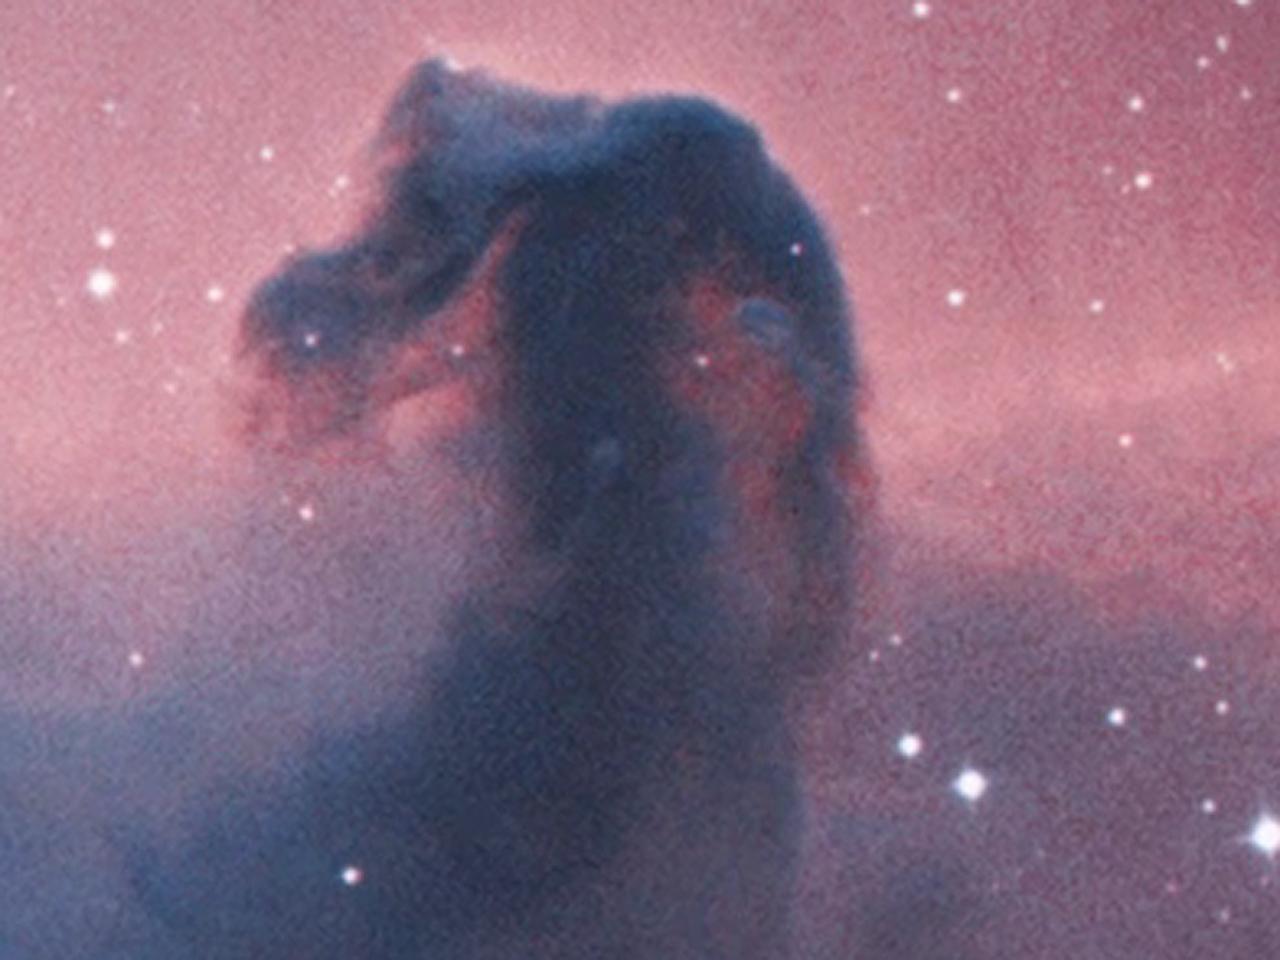 Hubble Revisits Pillars Of Creation For Stunning Photo NBC News - Nasa release new hd photographs iconic pillars creation photo